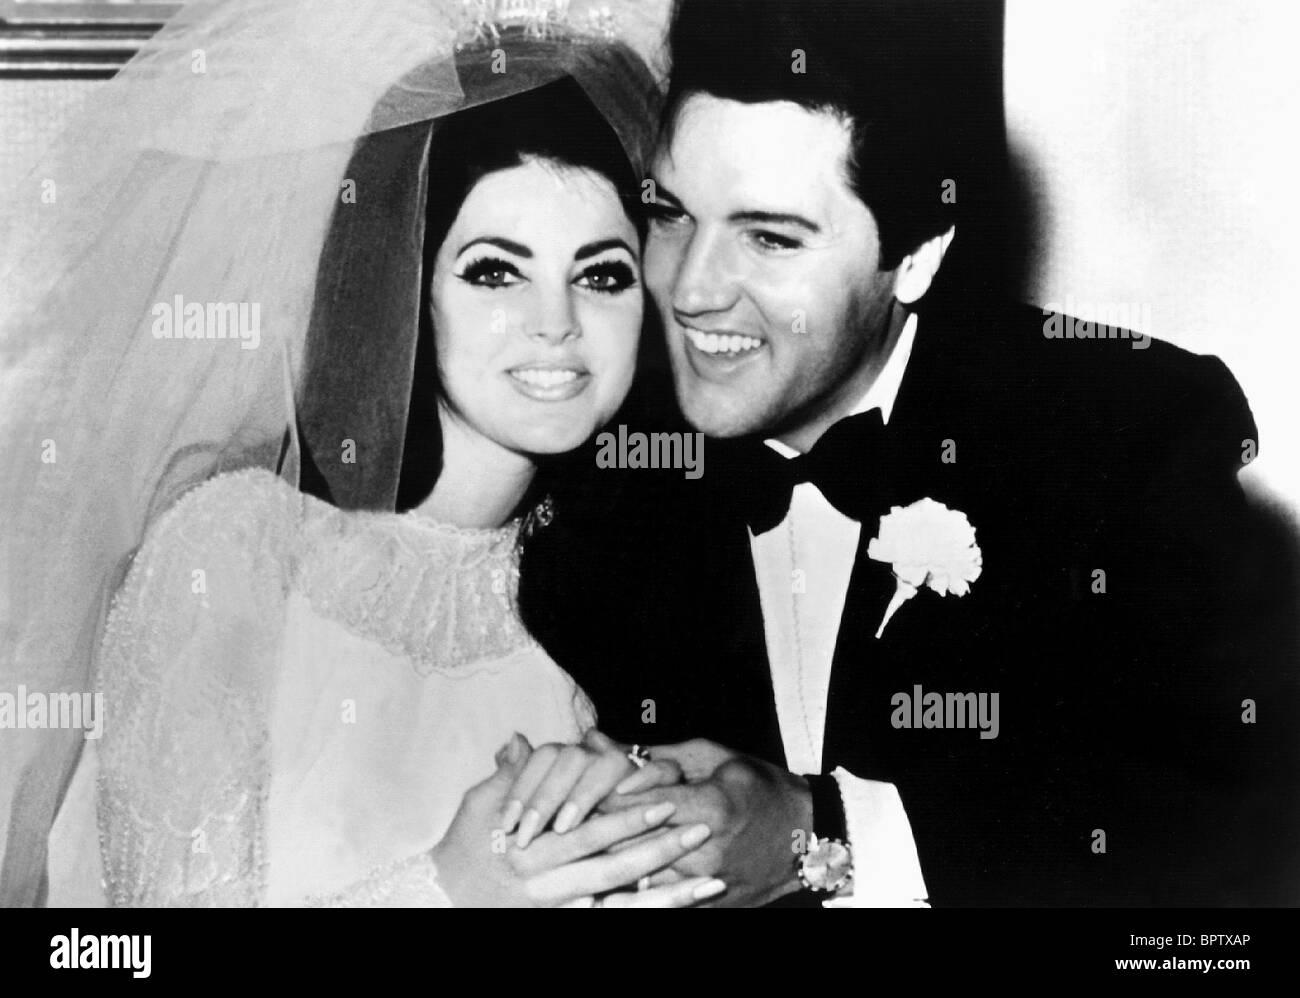 PRICILLA PRESLEY & ELVIS PRESLEY WIFE & HUSBAND (1967) Stock Foto